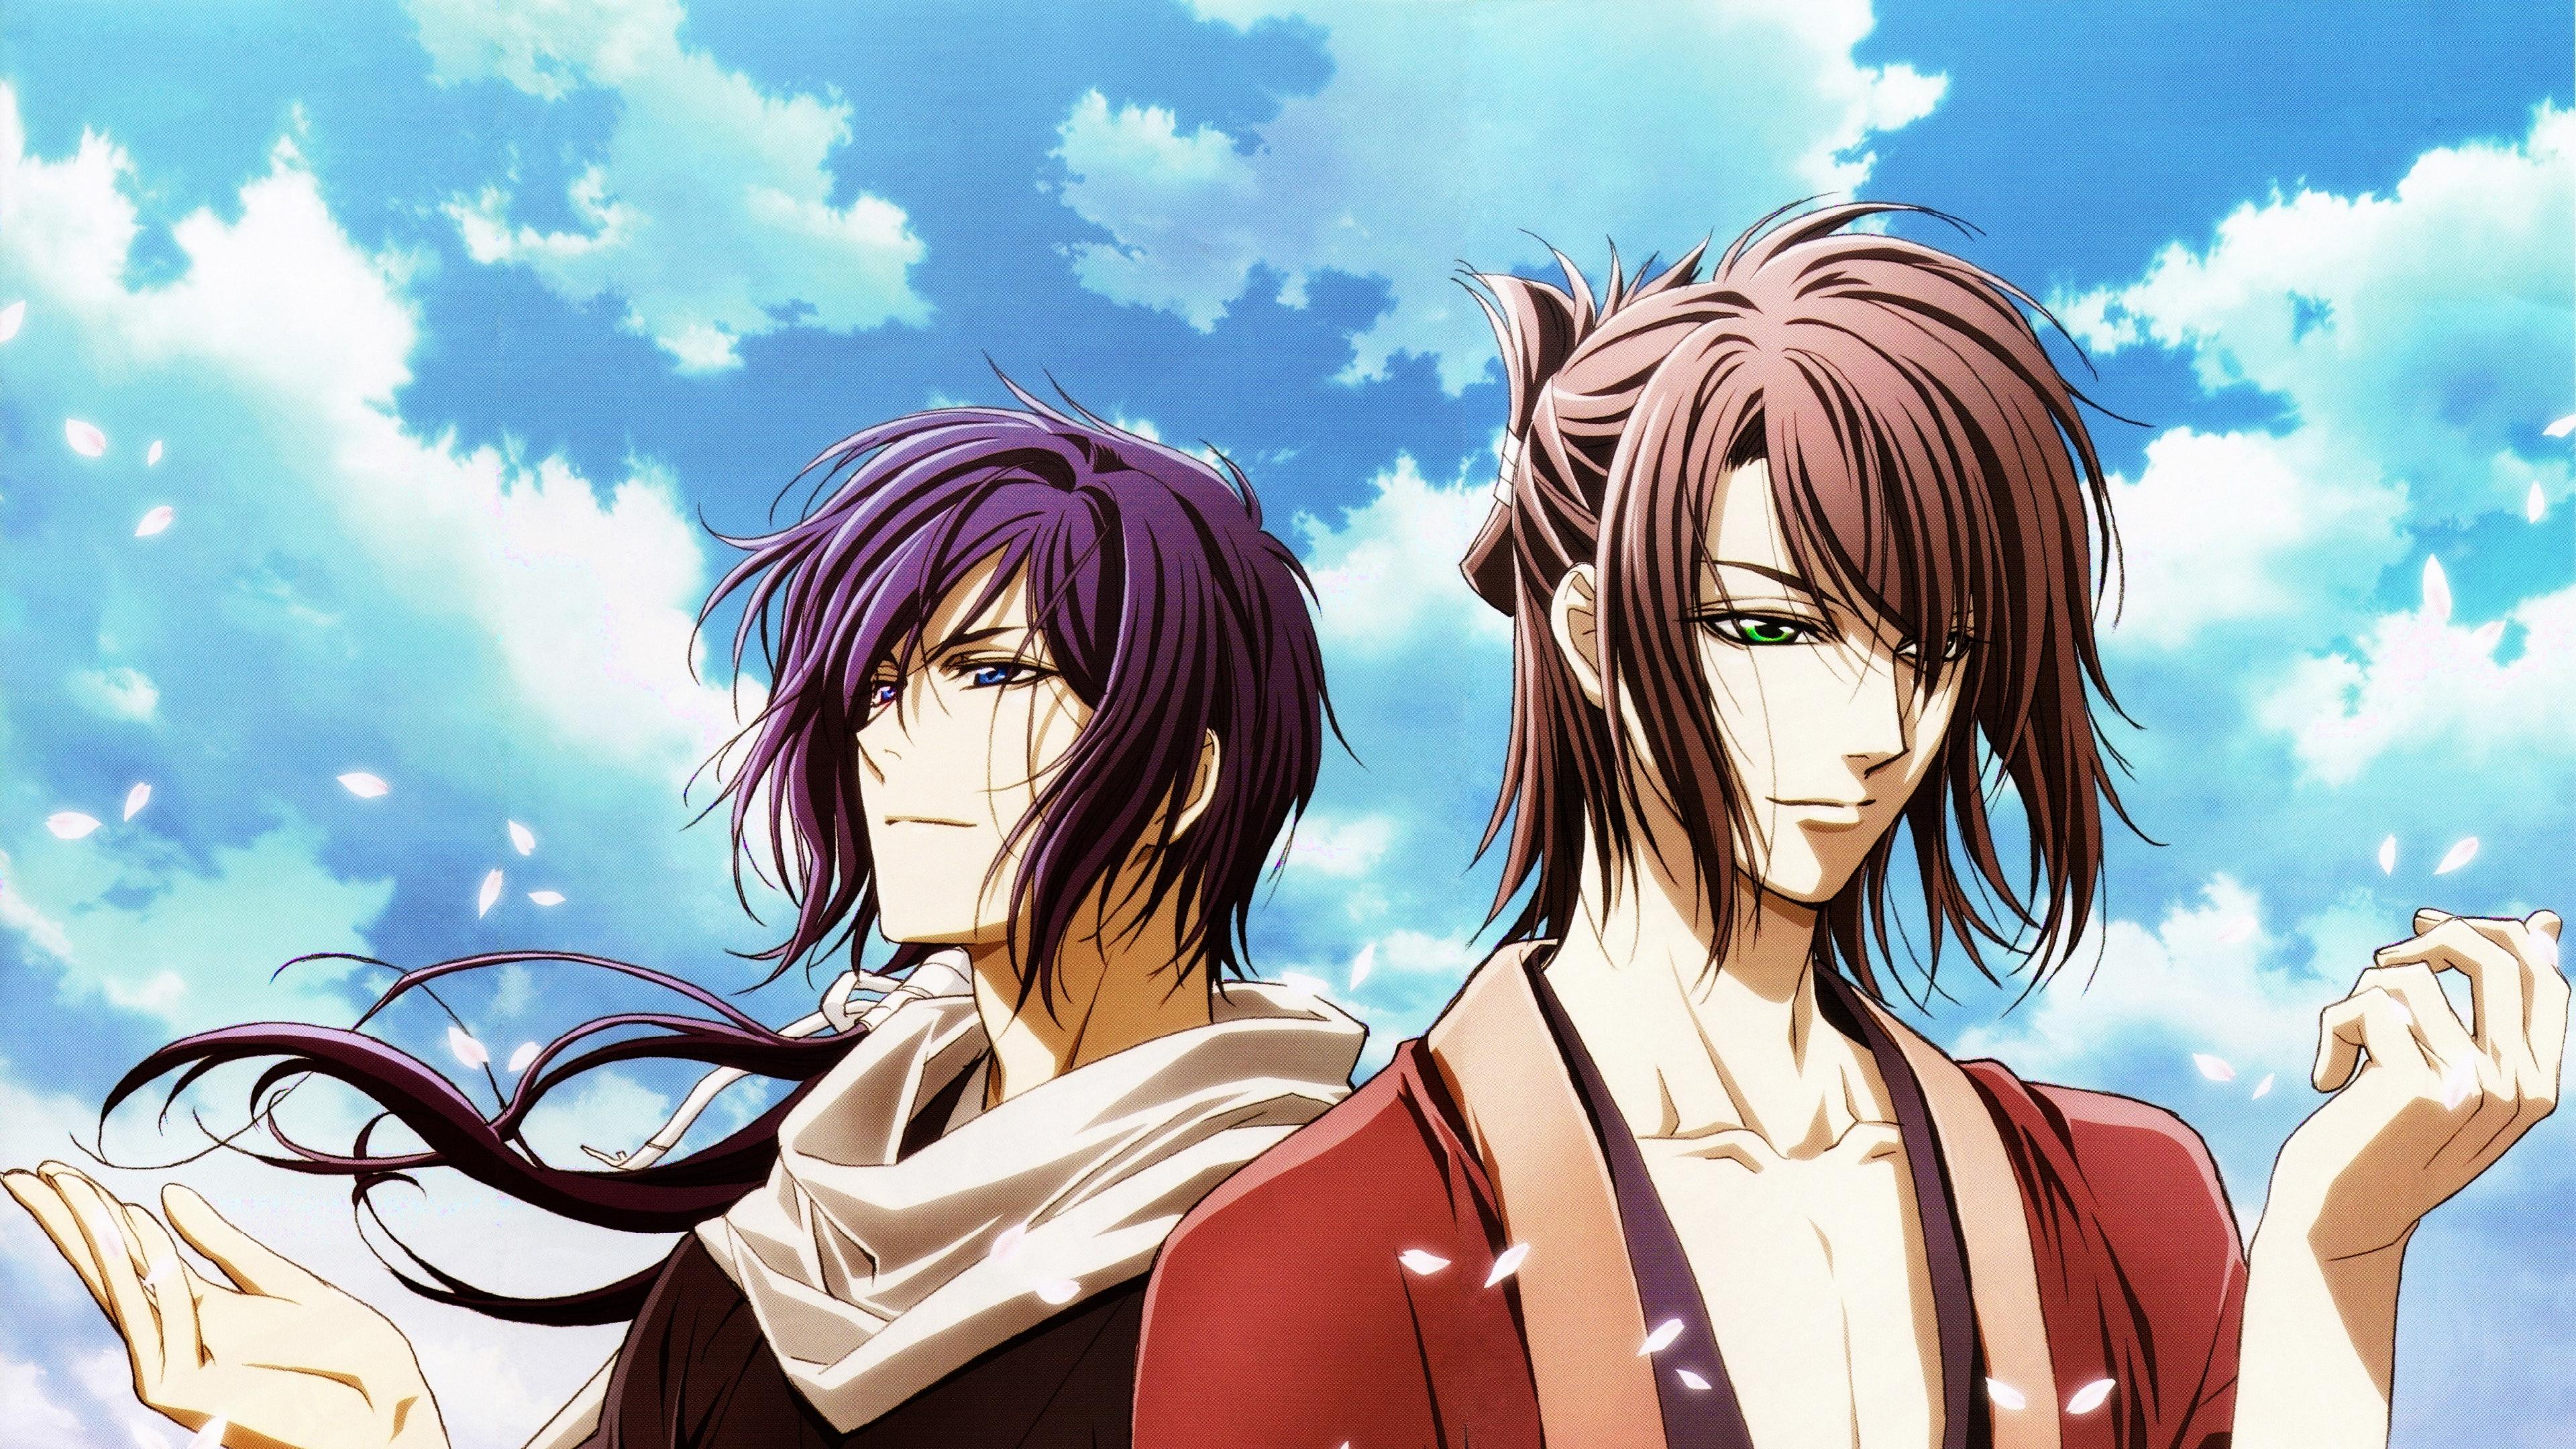 hakuouki shinsengumi kitan okita souji saitou hajime samurai 4k 1541975830 - hakuouki, shinsengumi kitan, okita souji, saitou hajime, samurai 4k - shinsengumi kitan, okita souji, hakuouki